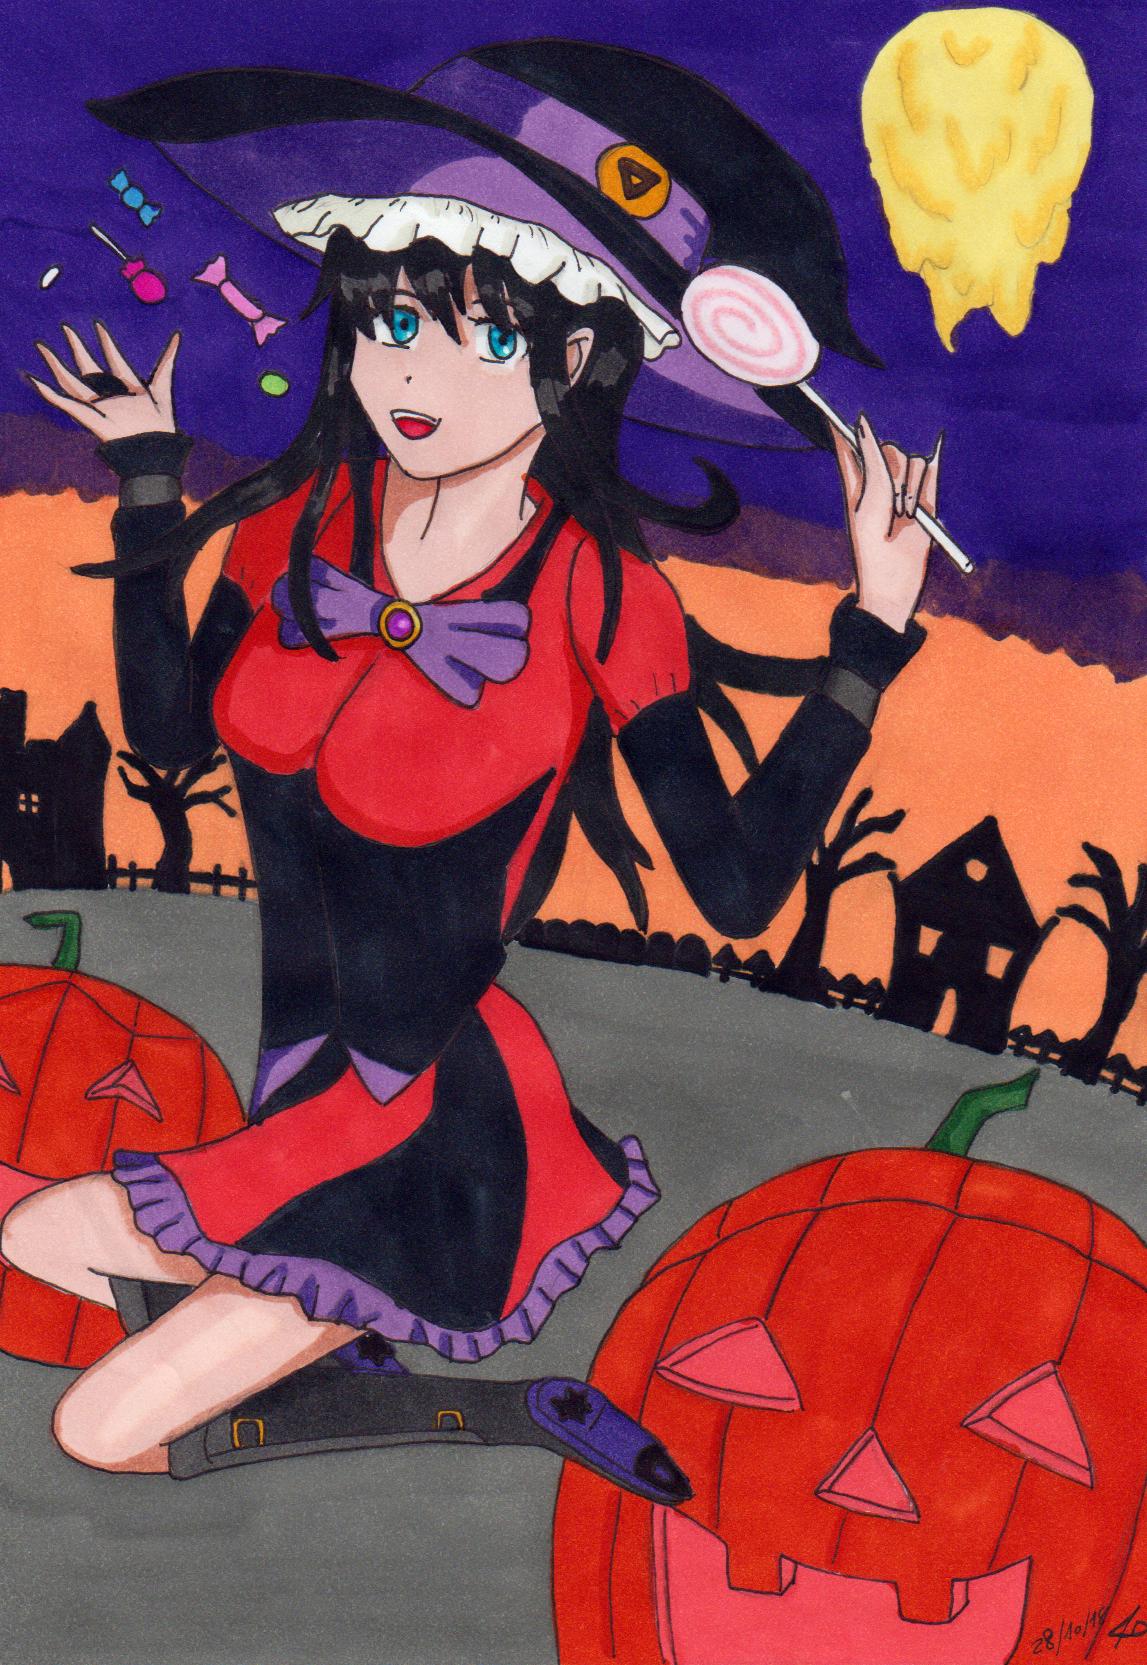 Luciehalloween18 by manga-DH